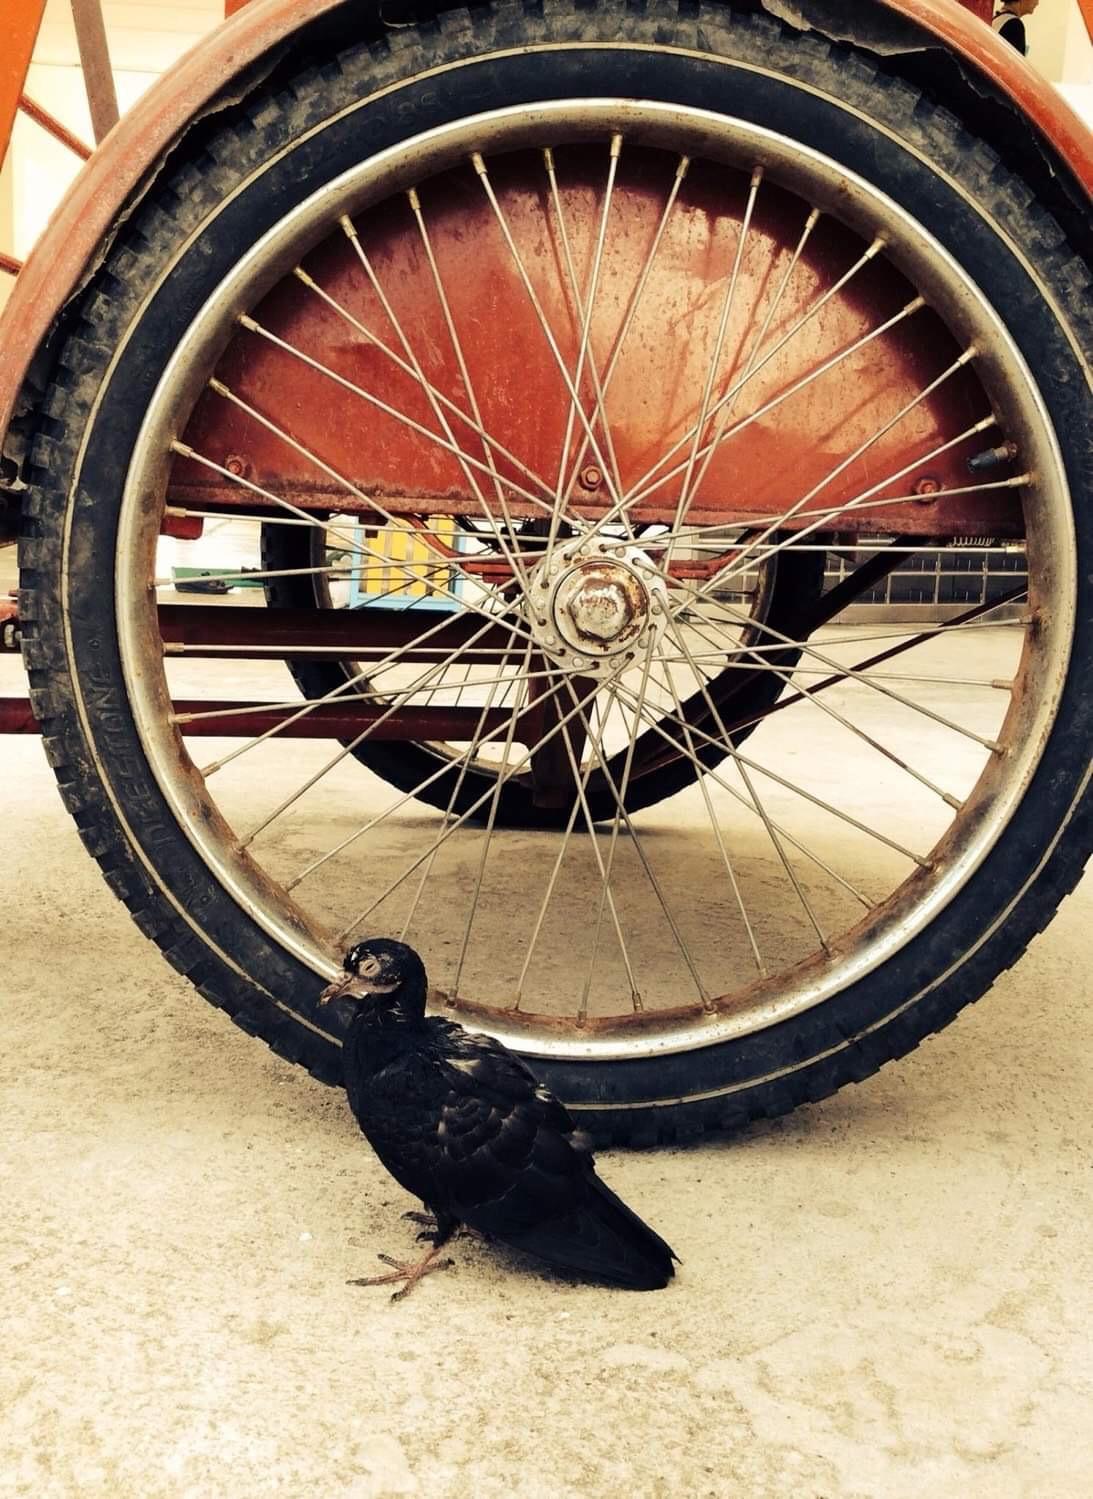 POOR BLACK PIGEON THAT CAN'T FLY 🐧🦜🕊( นกพิราบดำที่บินไม่ได้ที่น่าสงสาร 🐧🦜🕊 )